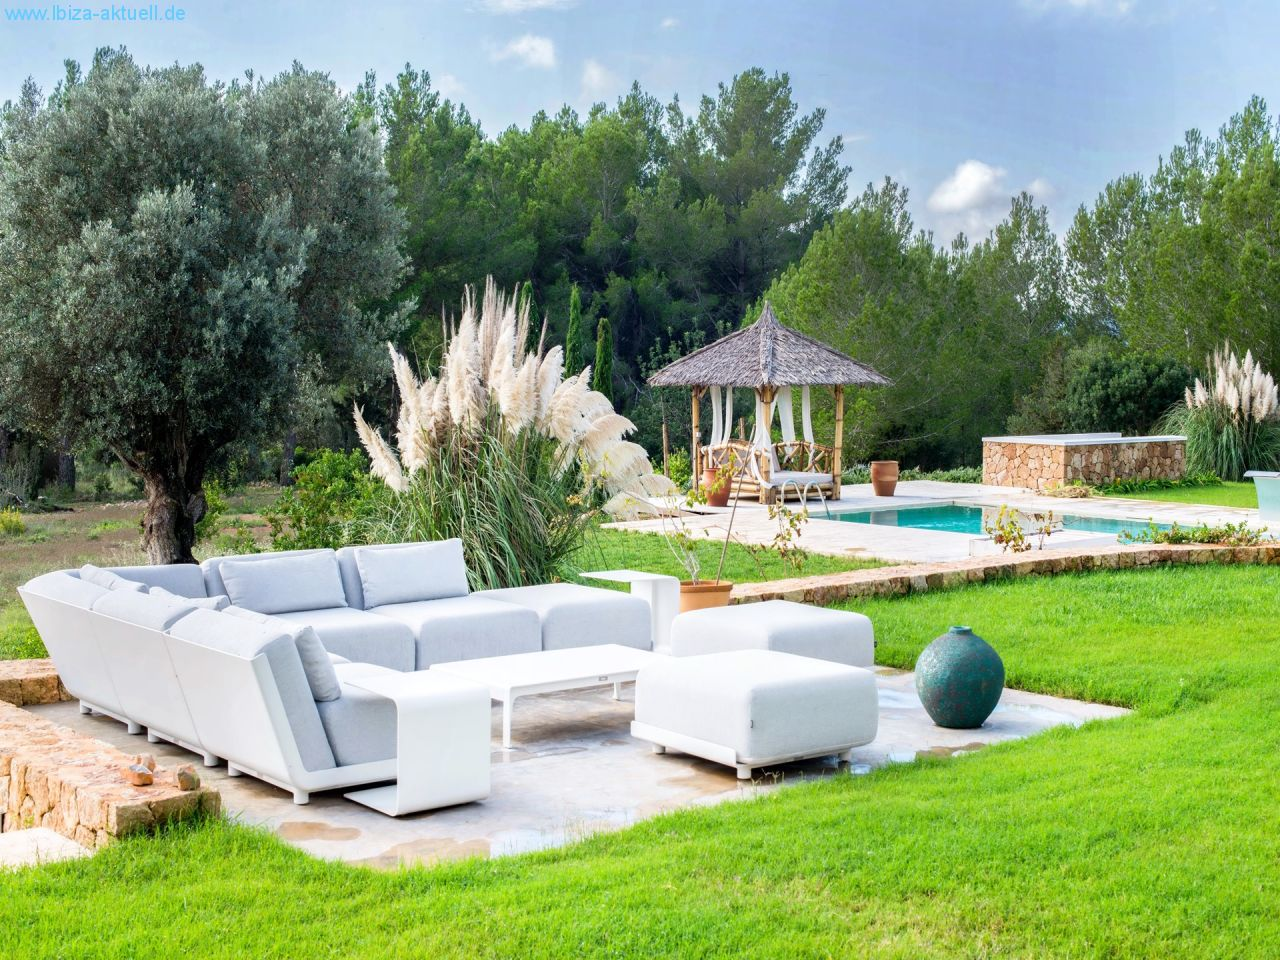 luxusvilla meerblick. Black Bedroom Furniture Sets. Home Design Ideas